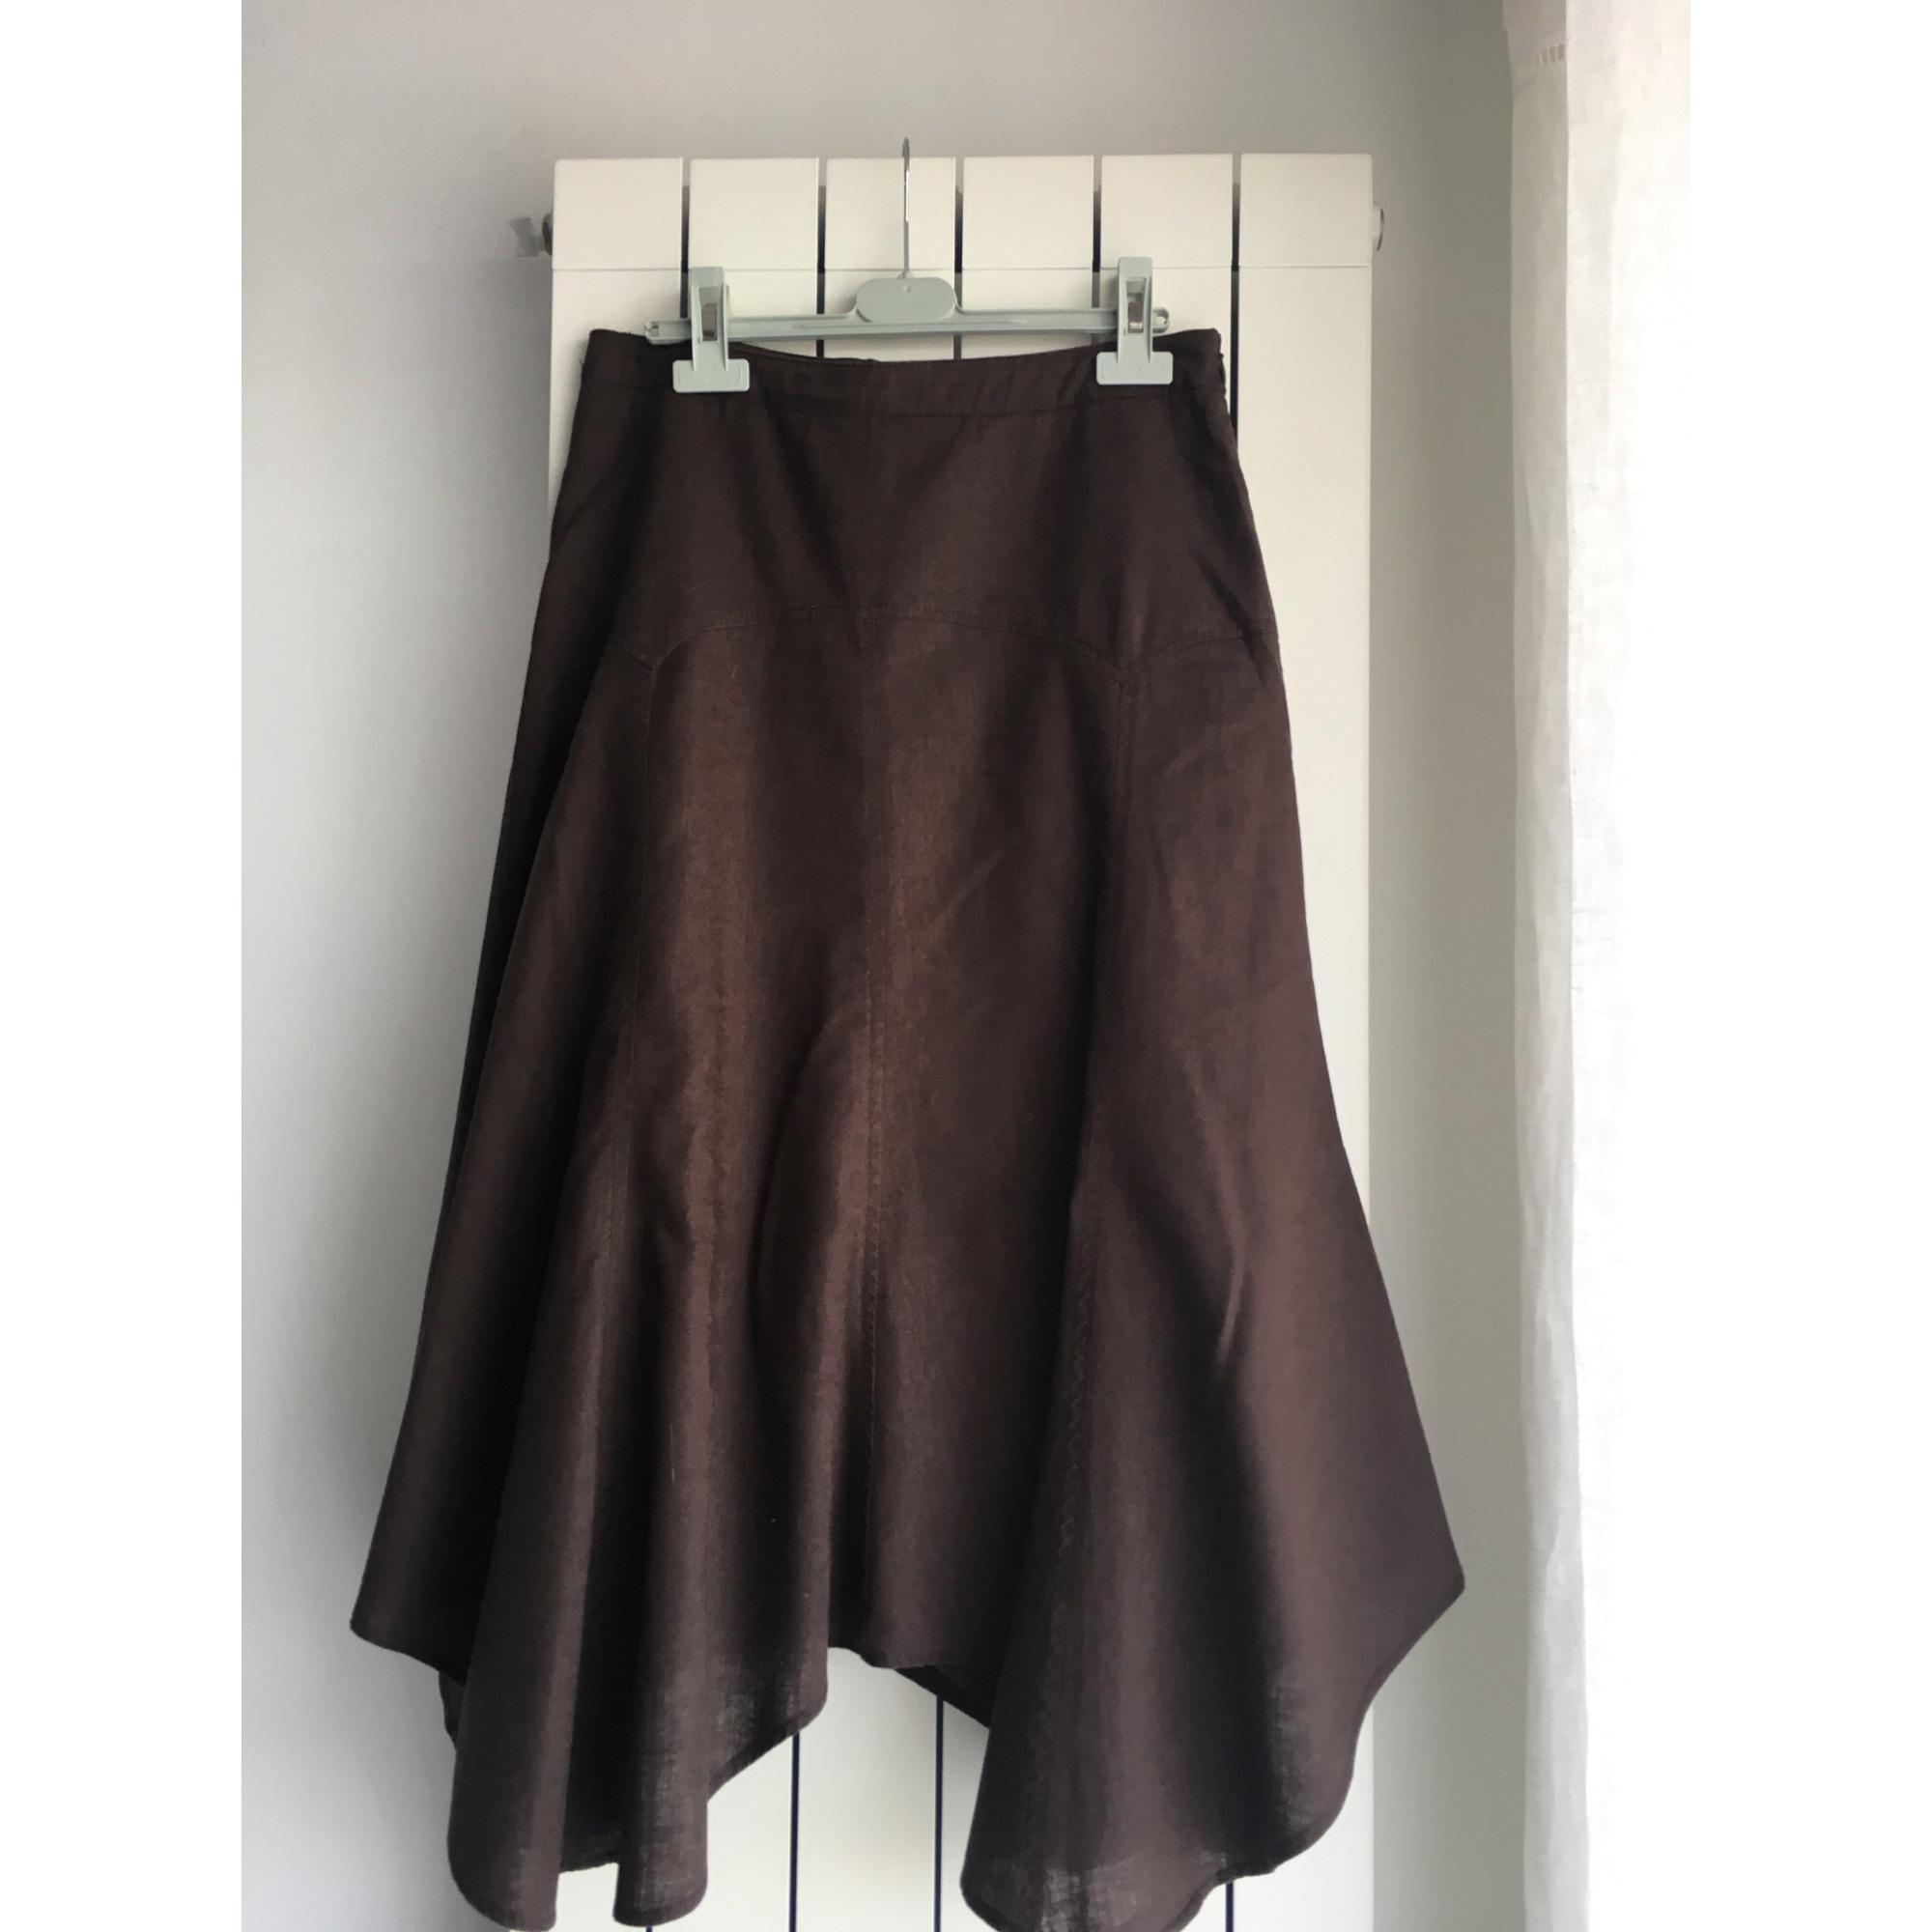 Midi Skirt ESPRIT Brown